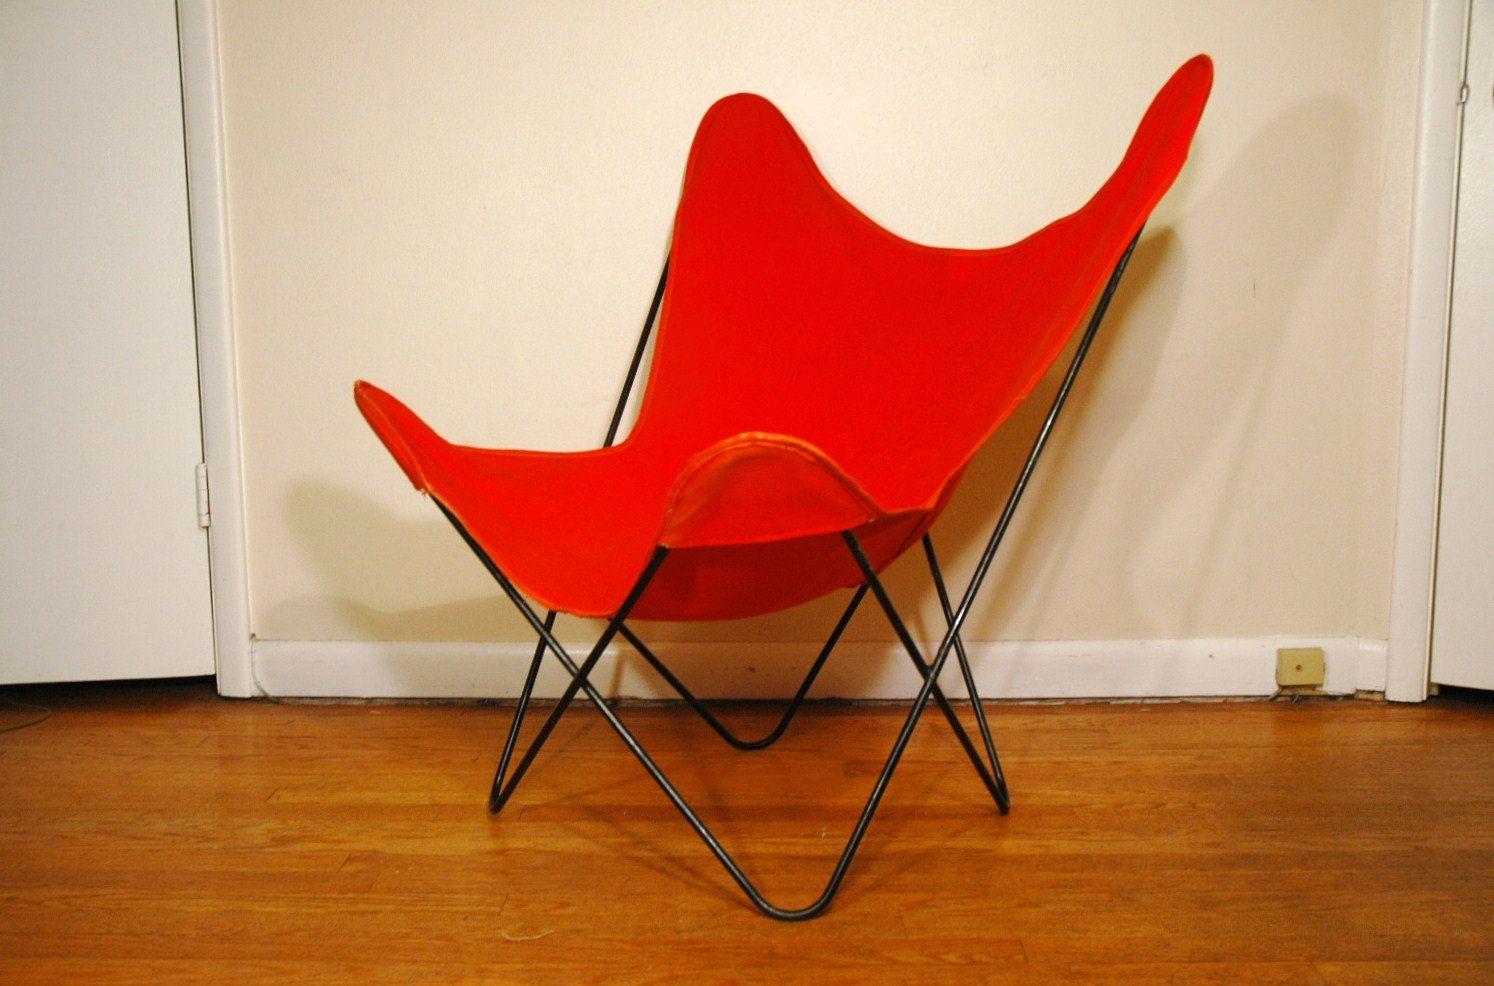 Beautiful Knoll Hardoy Butterfly Chair   Mid Century Modern Orange B.K.F. Chair.  $275.00, Via Etsy